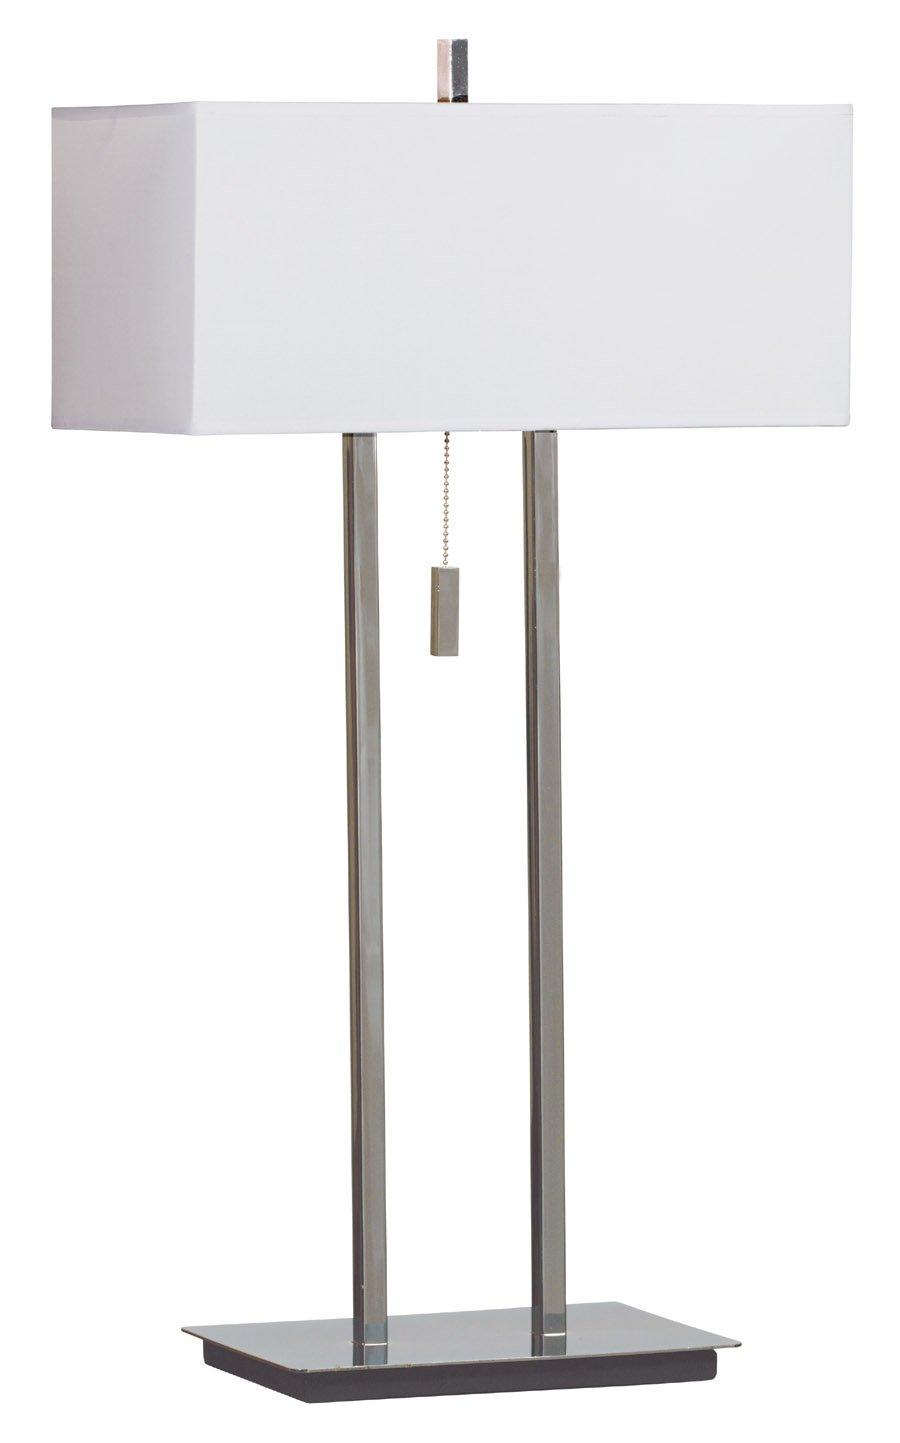 Kenroy Home 30816CH Emilio Table Lamp, Chrome   Kenroy Desk Lamp    Amazon.com